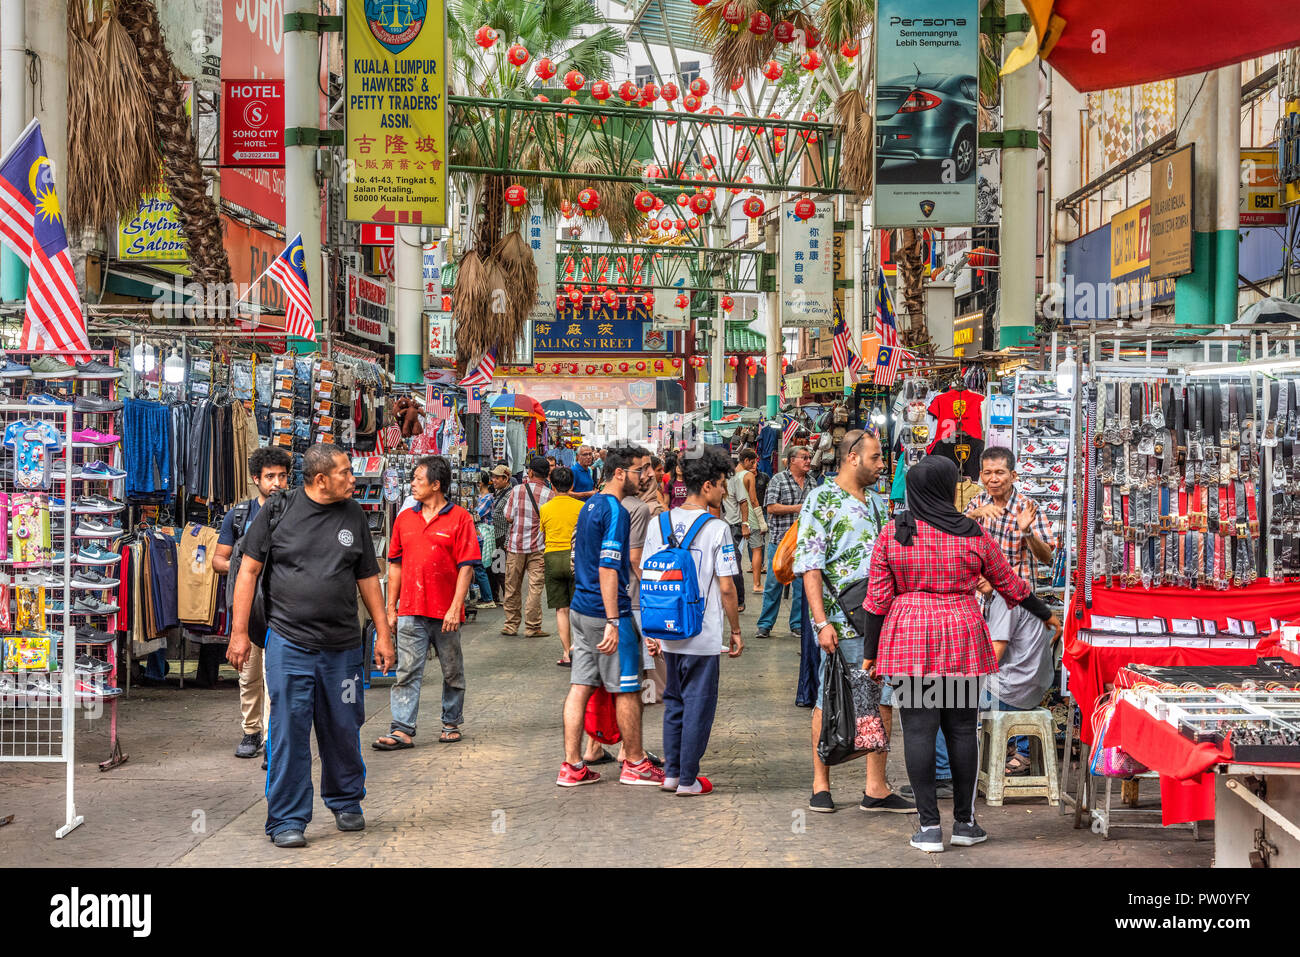 Petaling Street, Chinatown, Kuala Lumpur, Malesia Immagini Stock